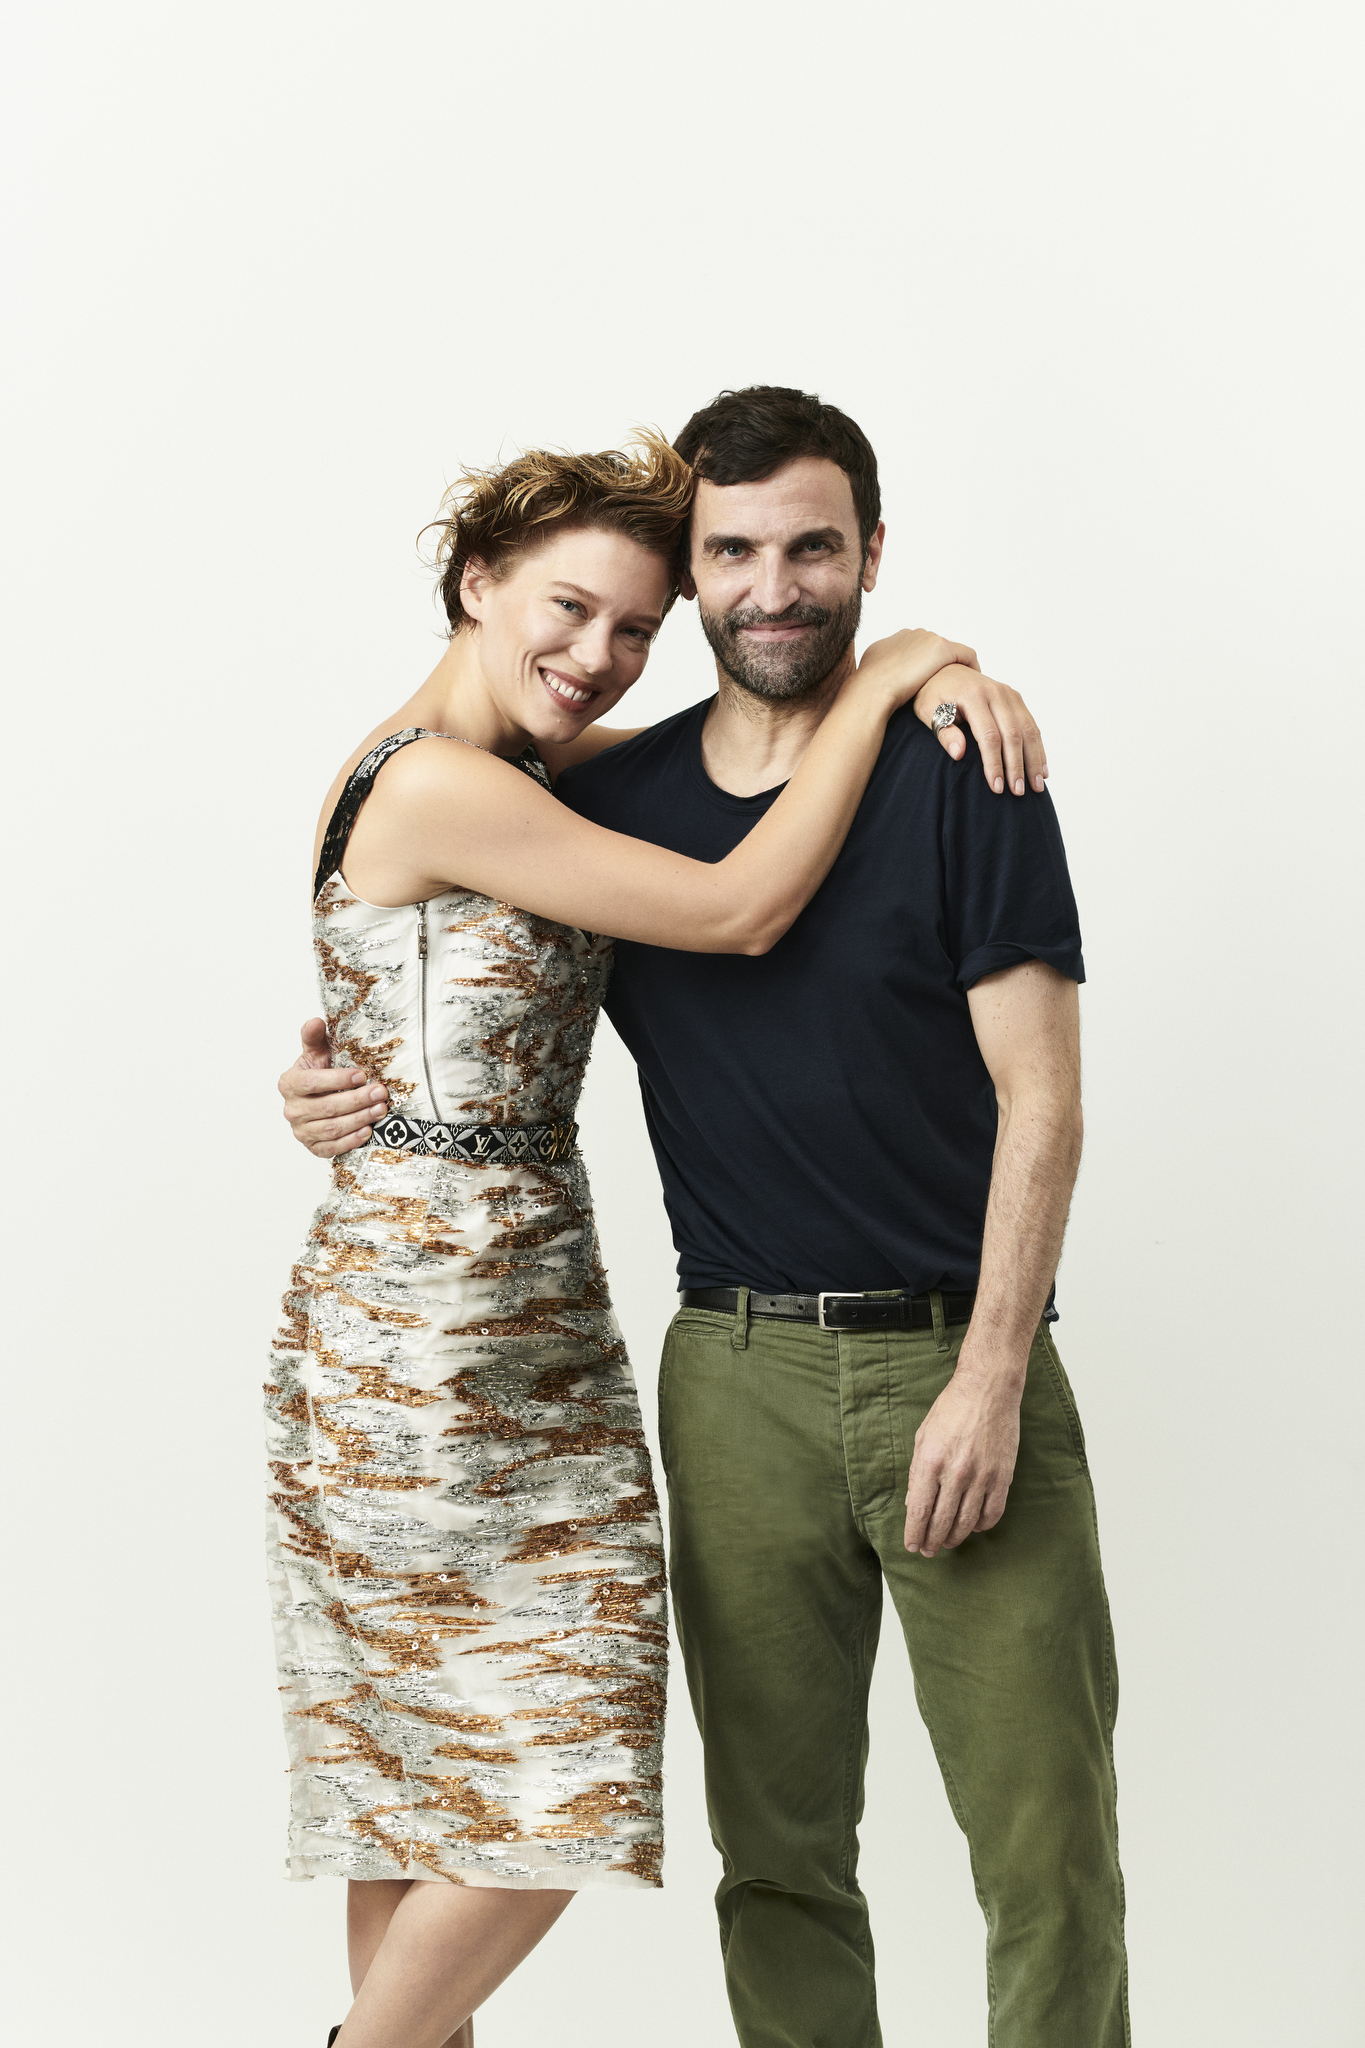 Léa Seydoux and Nicolas Ghesquière